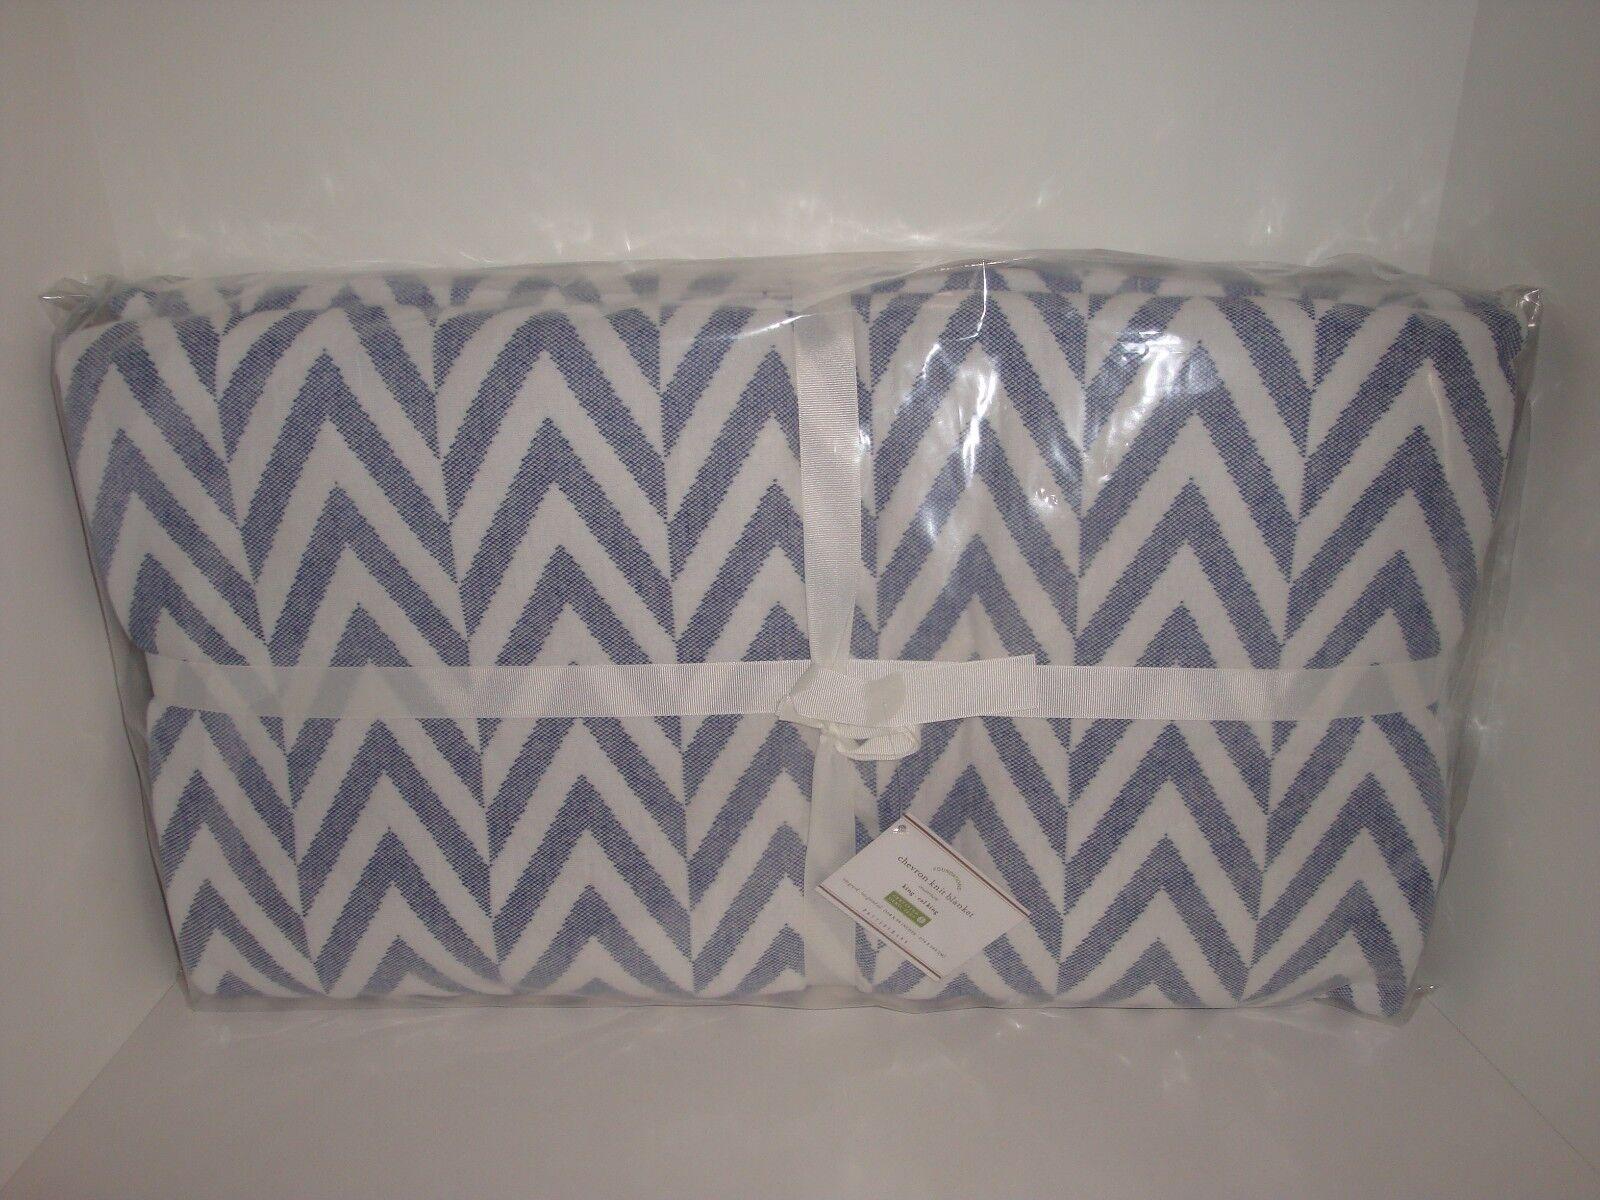 Pottery Barn Chevron Twilight bluee White King Blanket NIP Zig Zag Jersey Knit